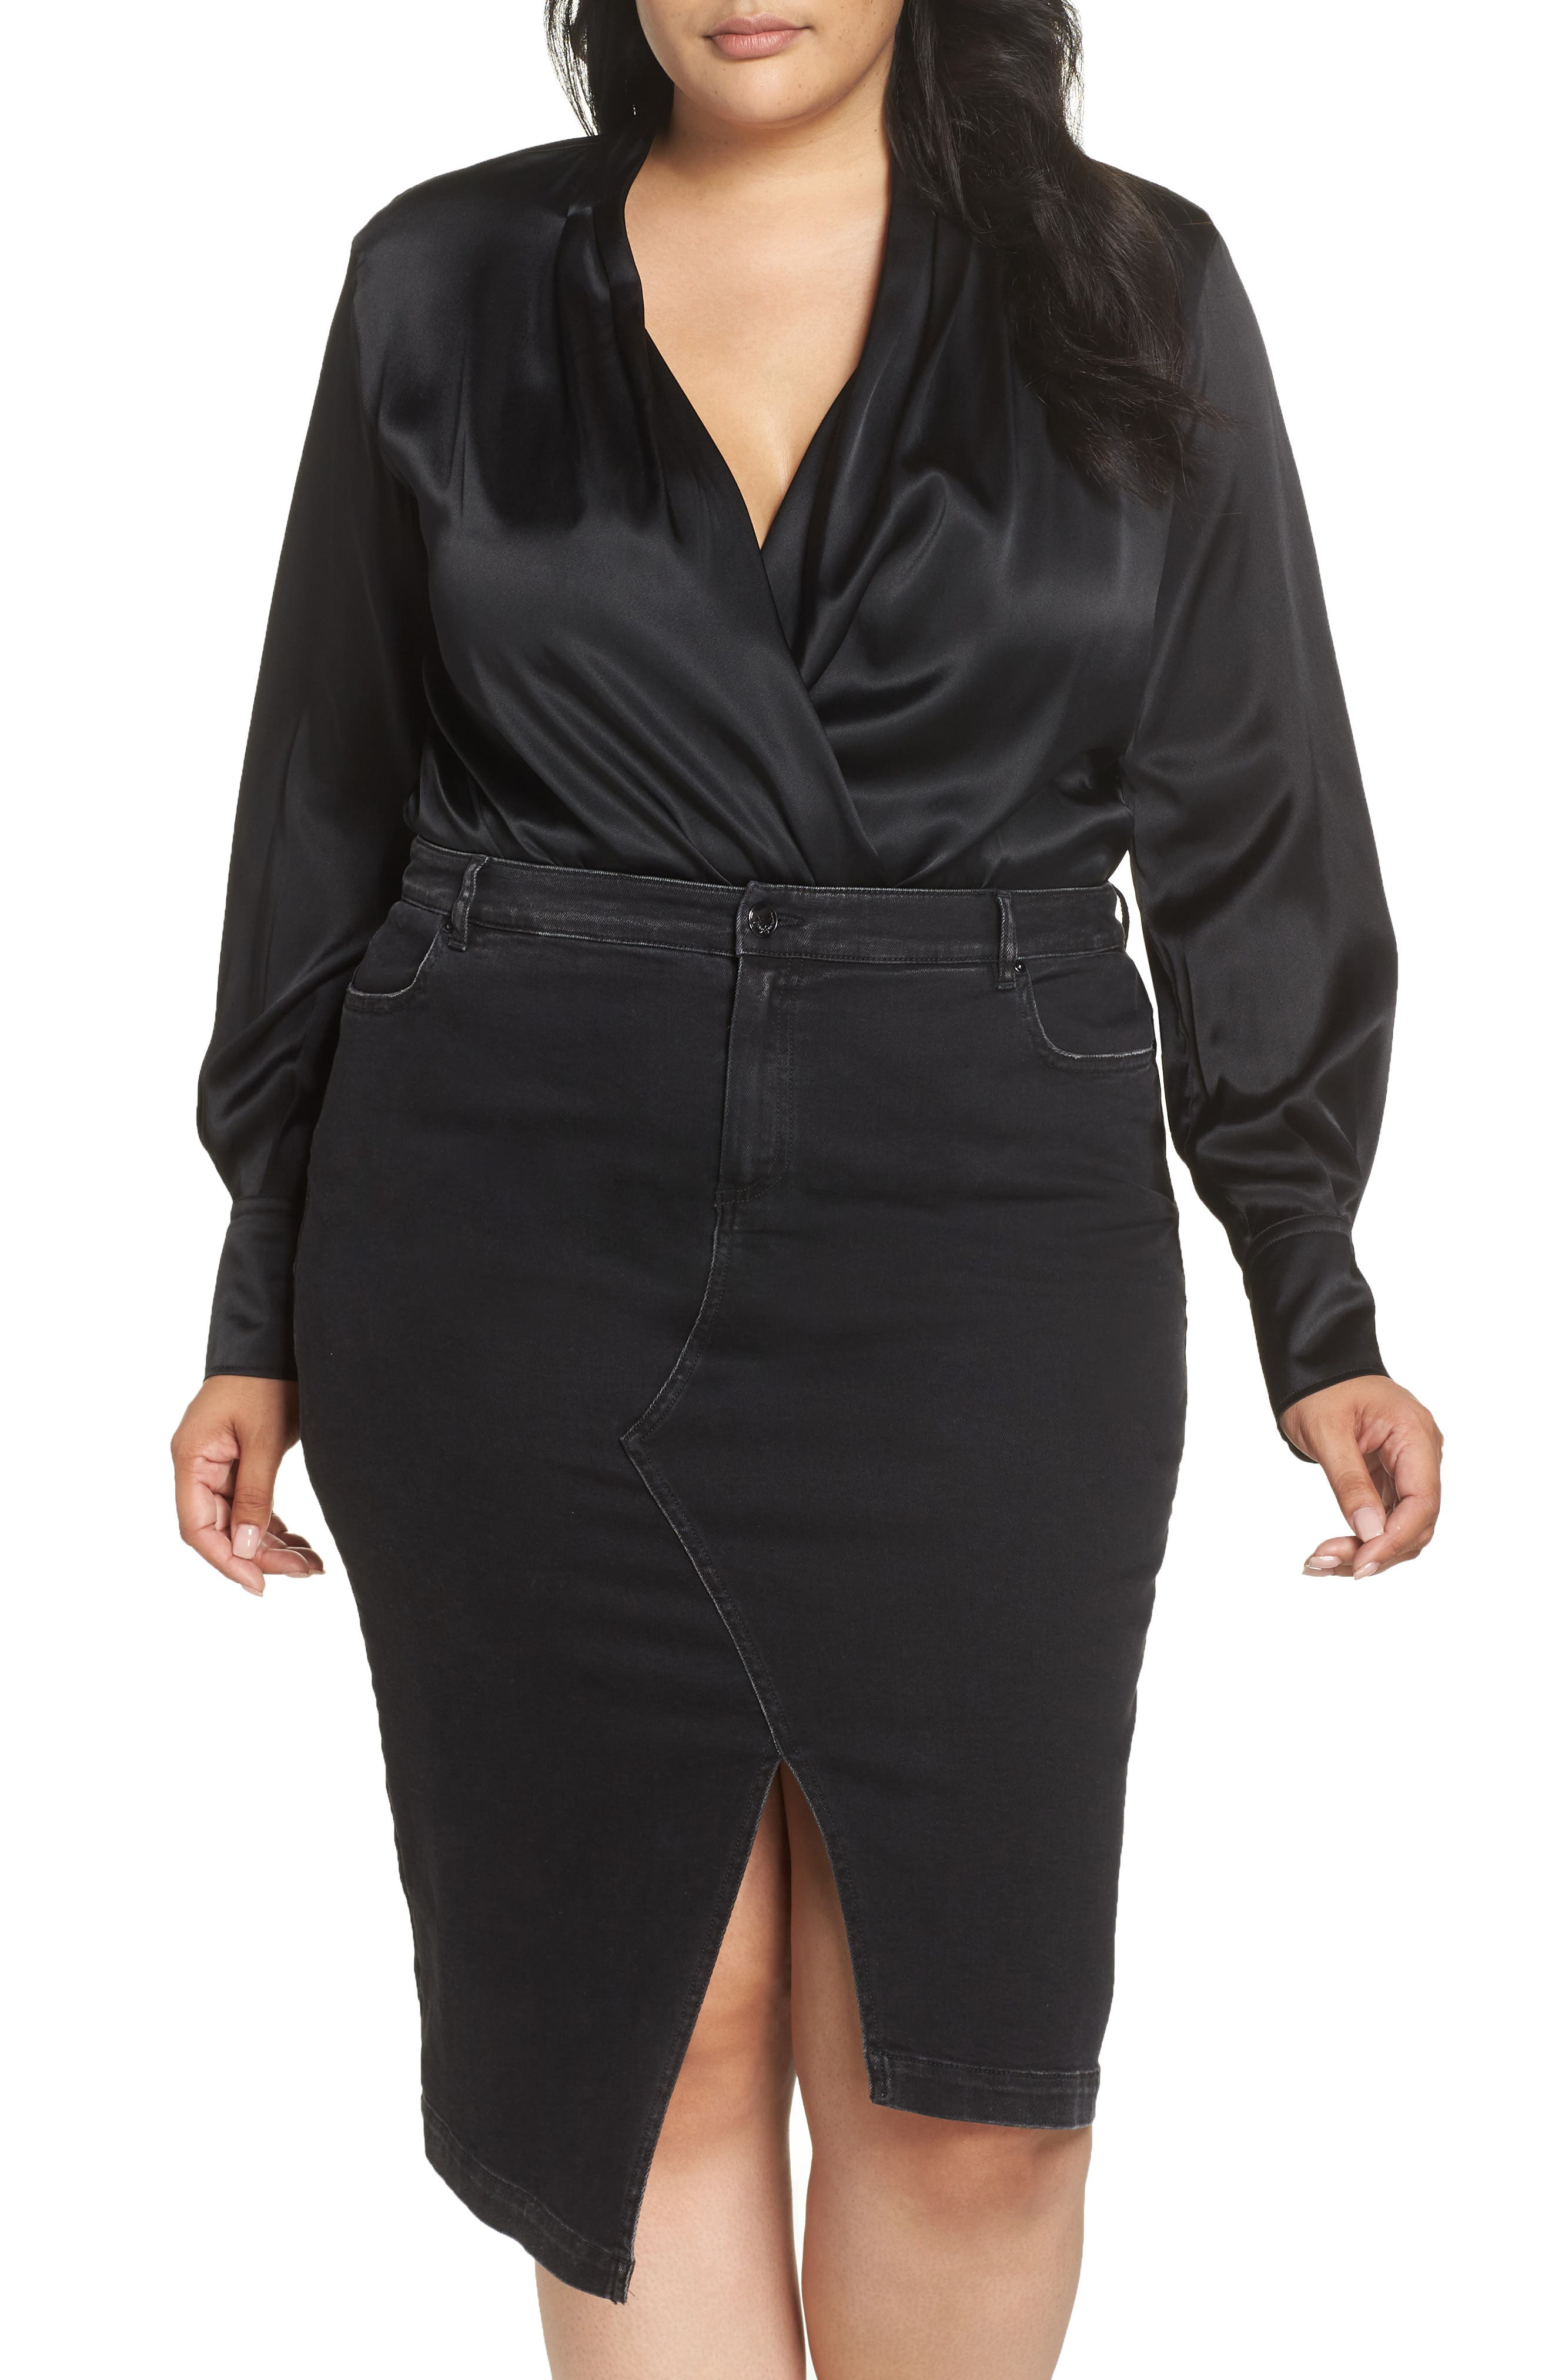 ASHLEY GRAHAM X MARINA RINALDI Bambola Bloused Bodysuit in Black 2